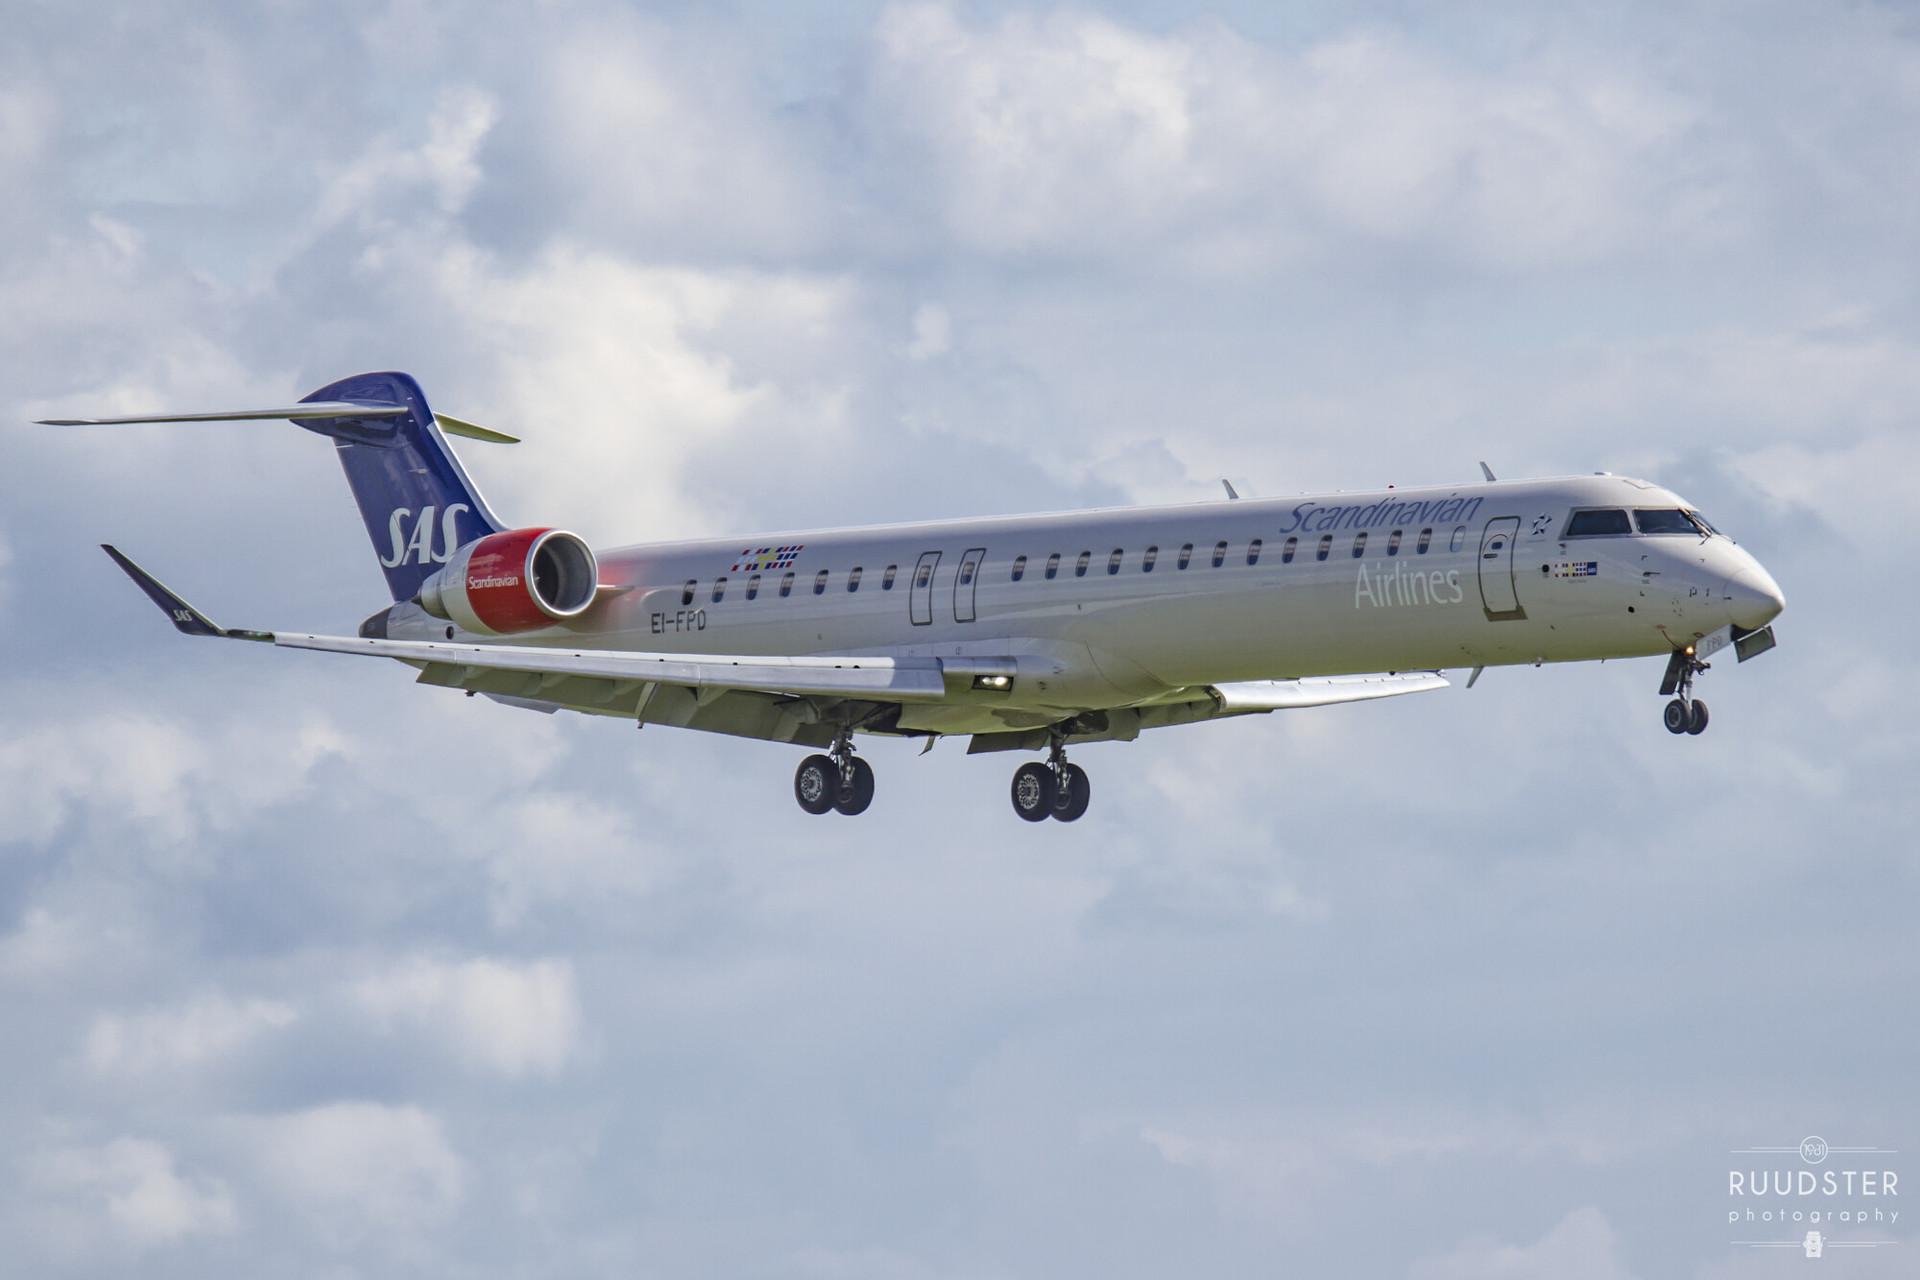 EI-FPD | Build: 2006 - Bombardier CRJ-900LR